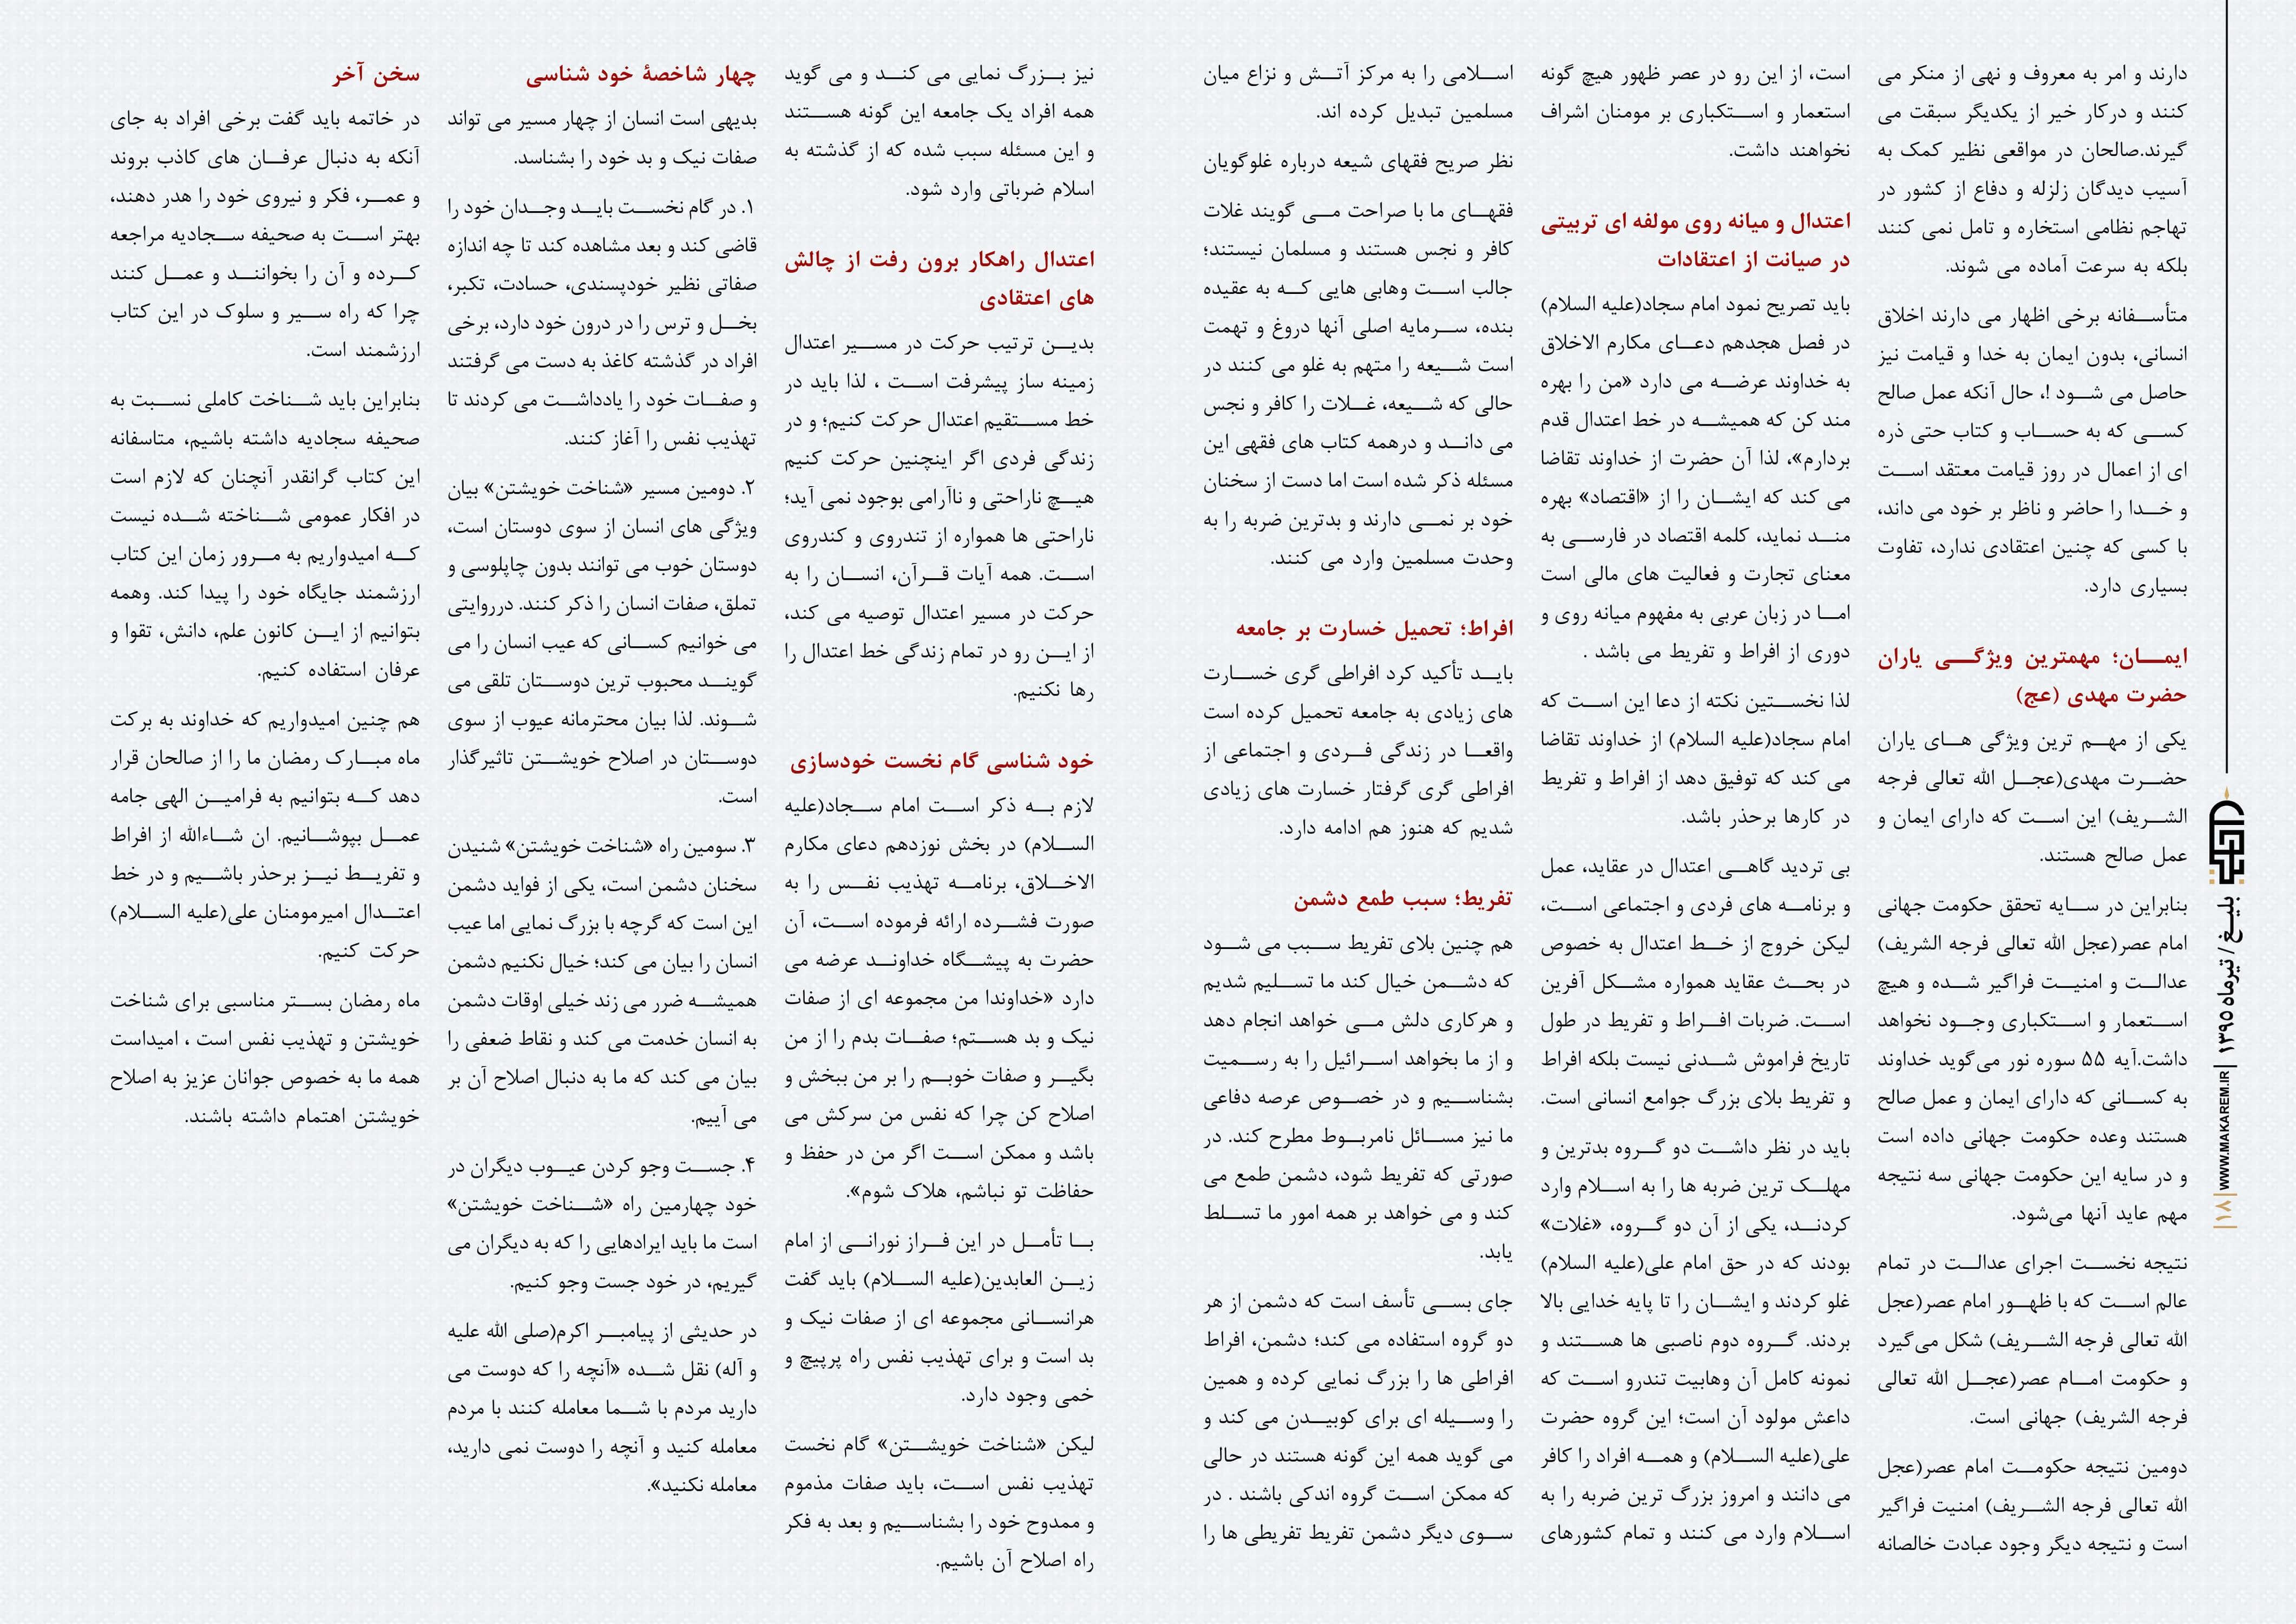 بلیغ 10-مدرسه الامام امیر المومنین (ع)